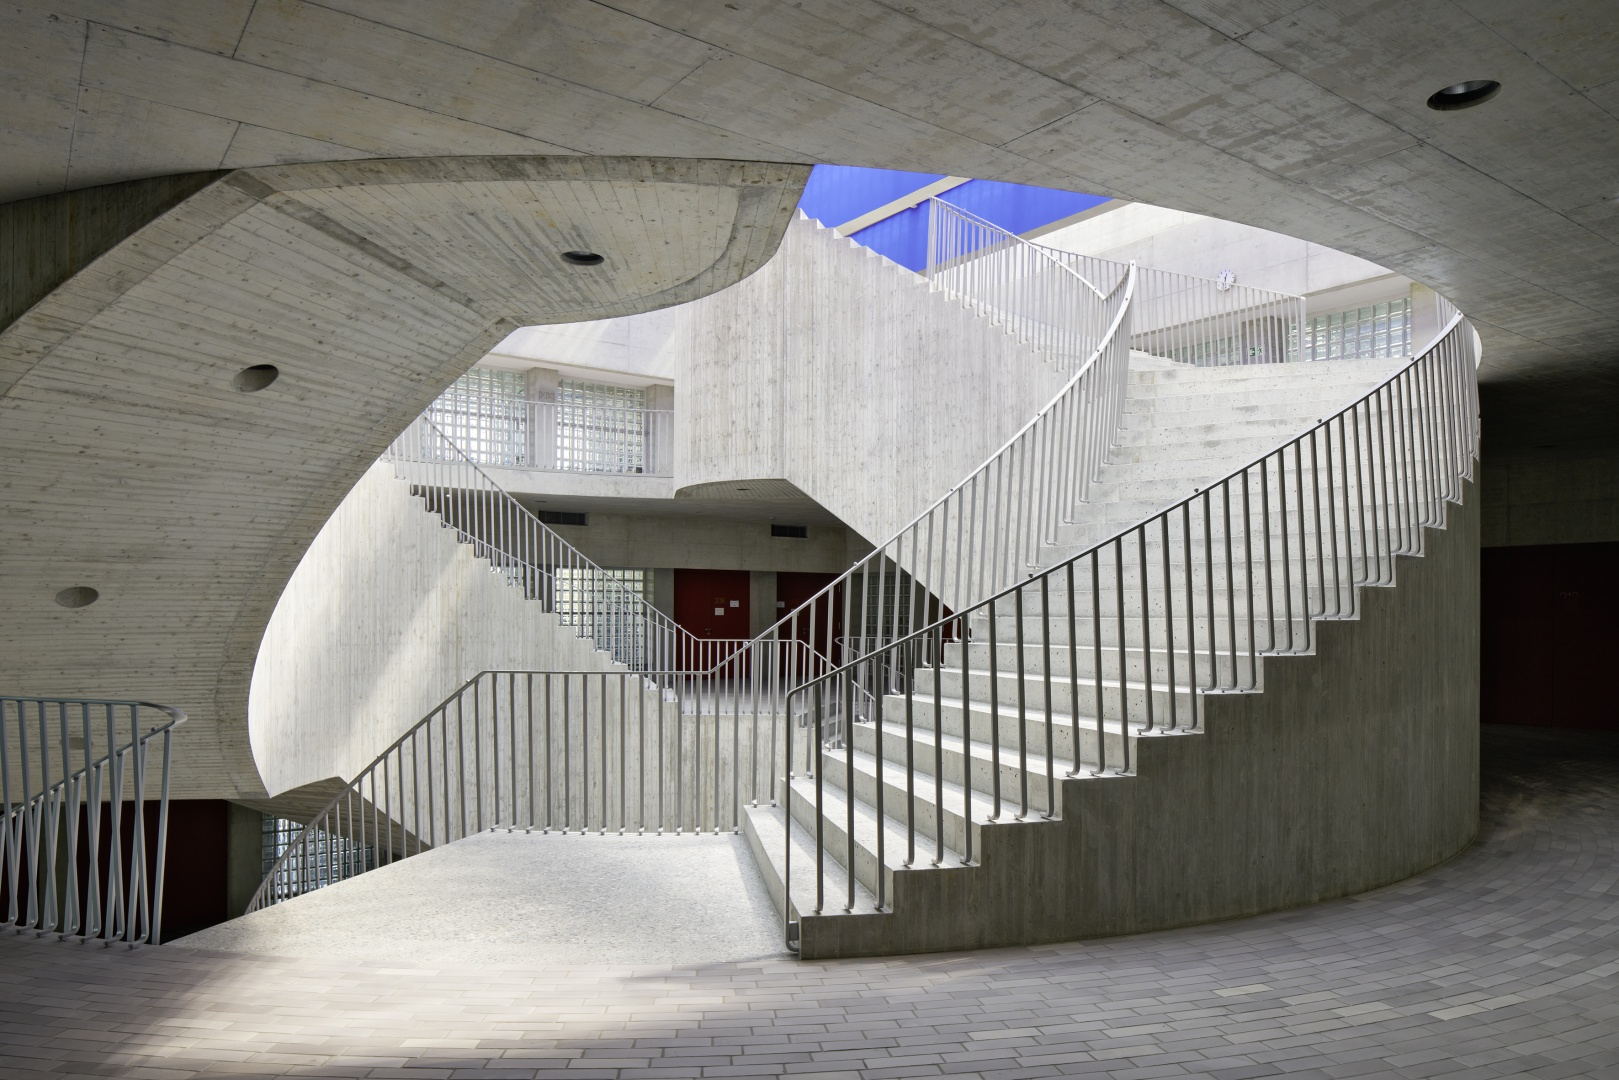 Treppenhaus Primarschule Vinci © Ralph Feiner